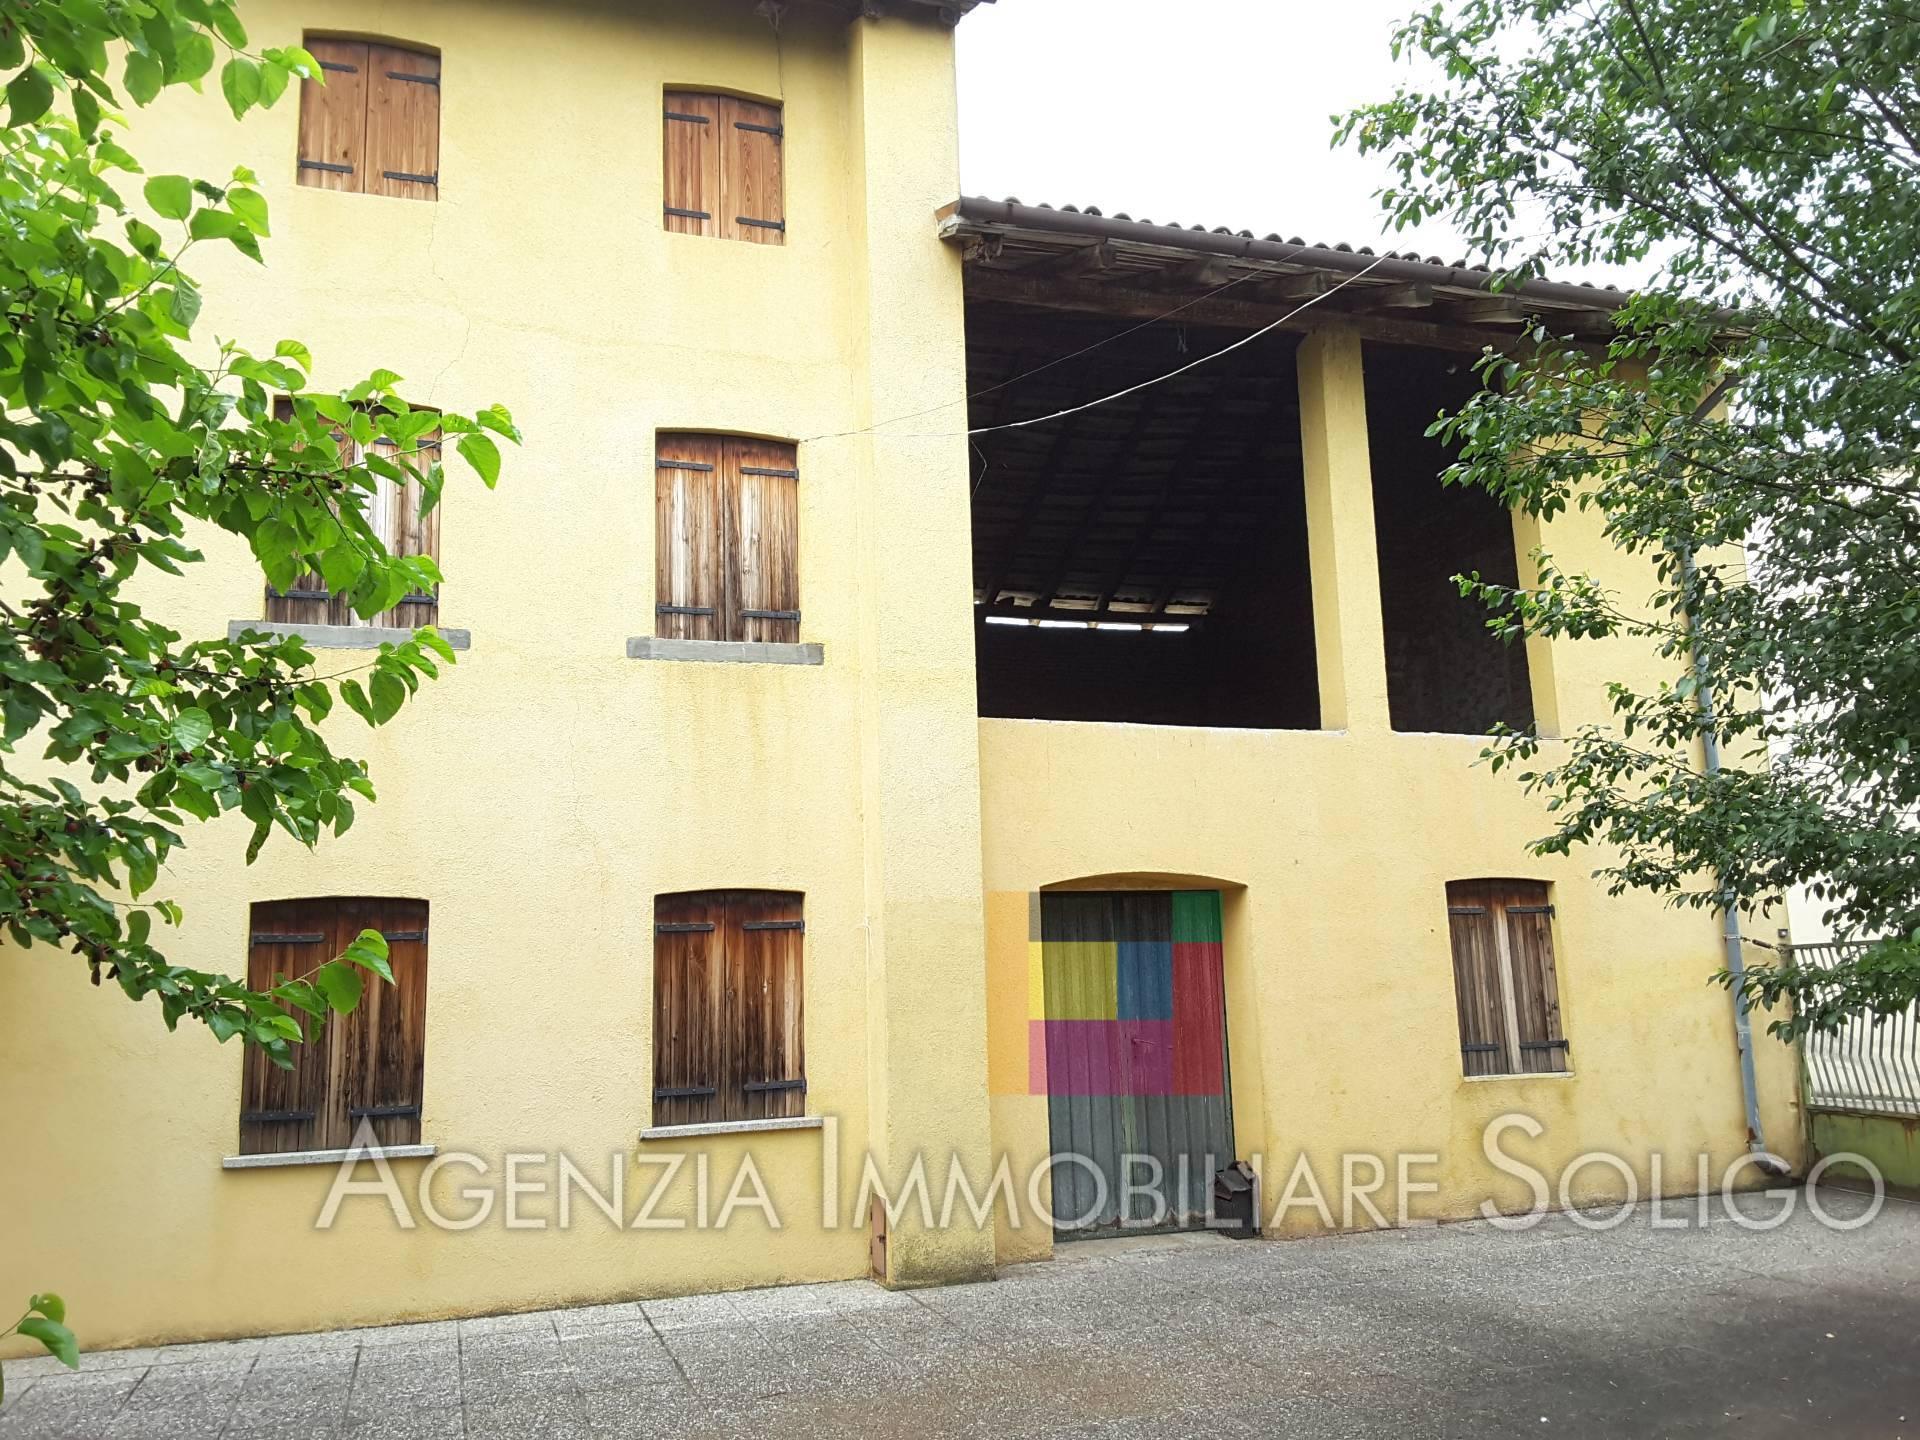 CASA INDIPENDENTE in Vendita a Pieve Di Soligo (TREVISO)